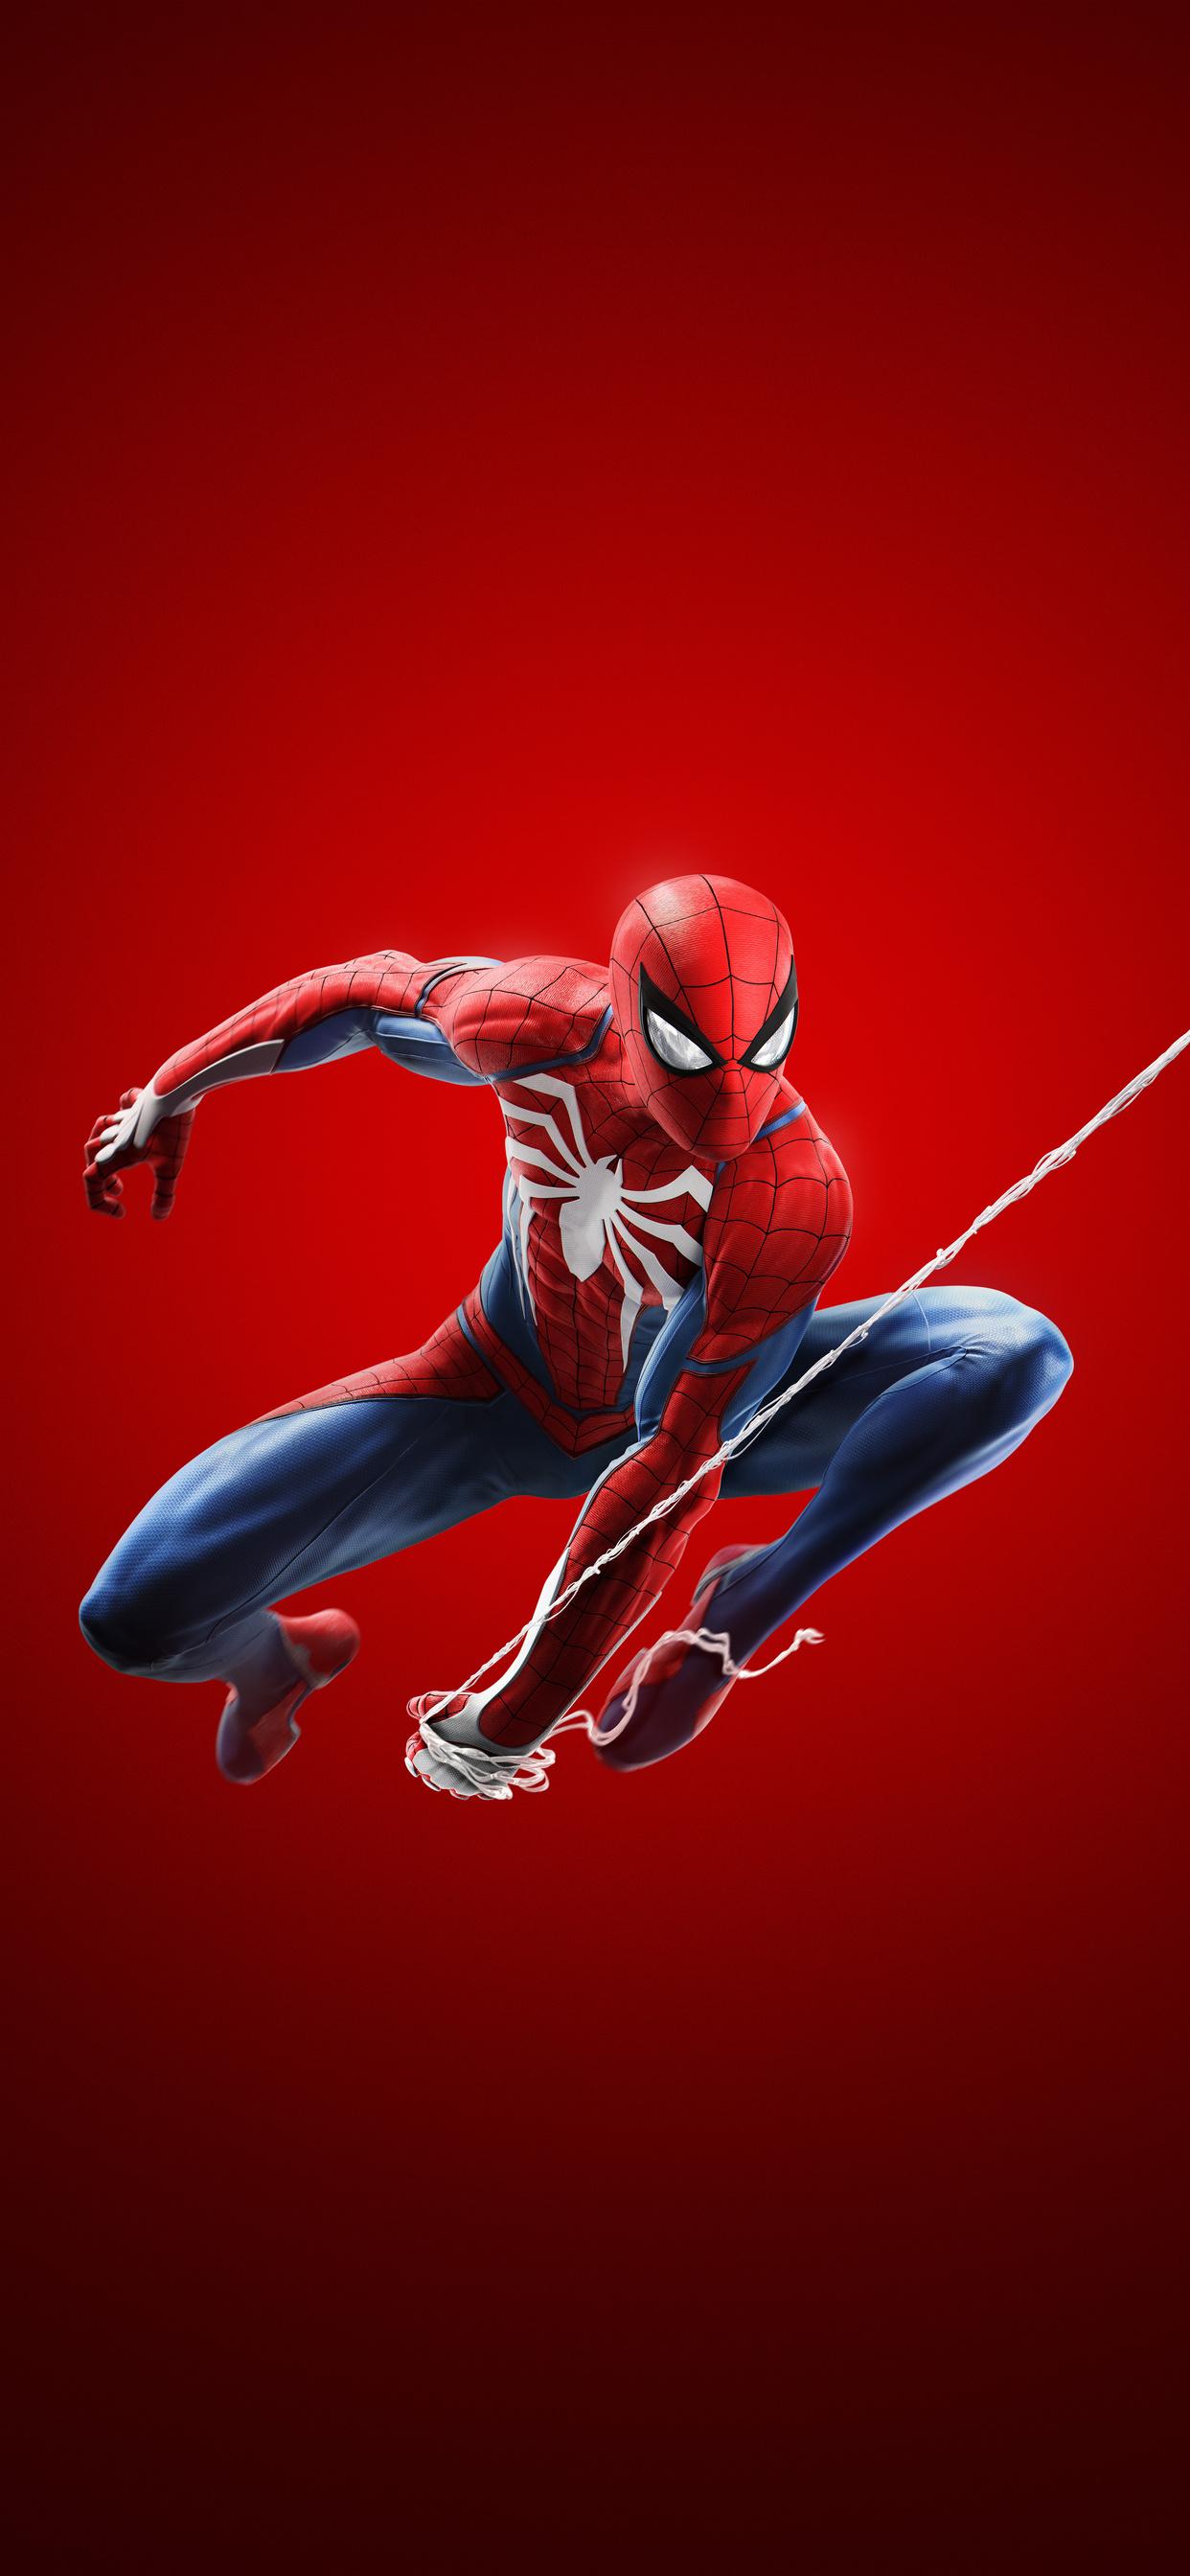 1242x2688 Spiderman Ps4 10k Iphone XS MAX HD 4k Wallpapers ...